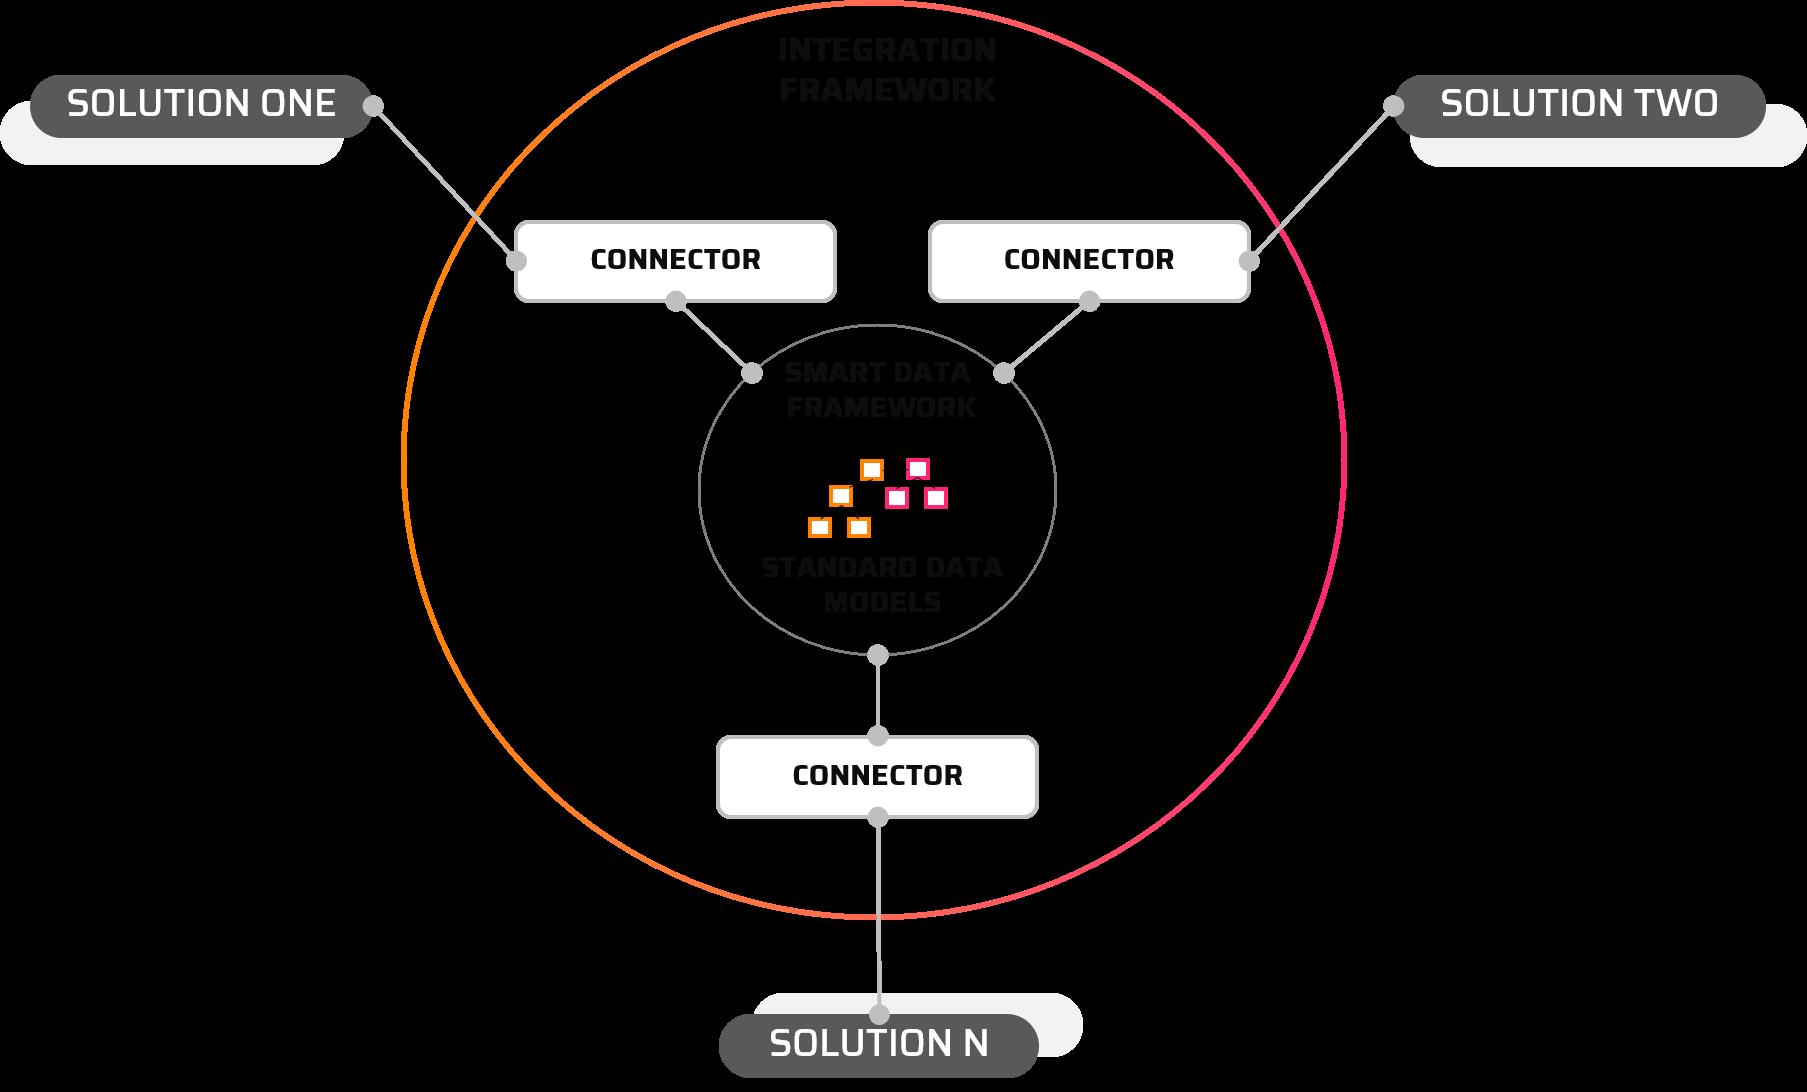 Scenarios - Open Integration Hub